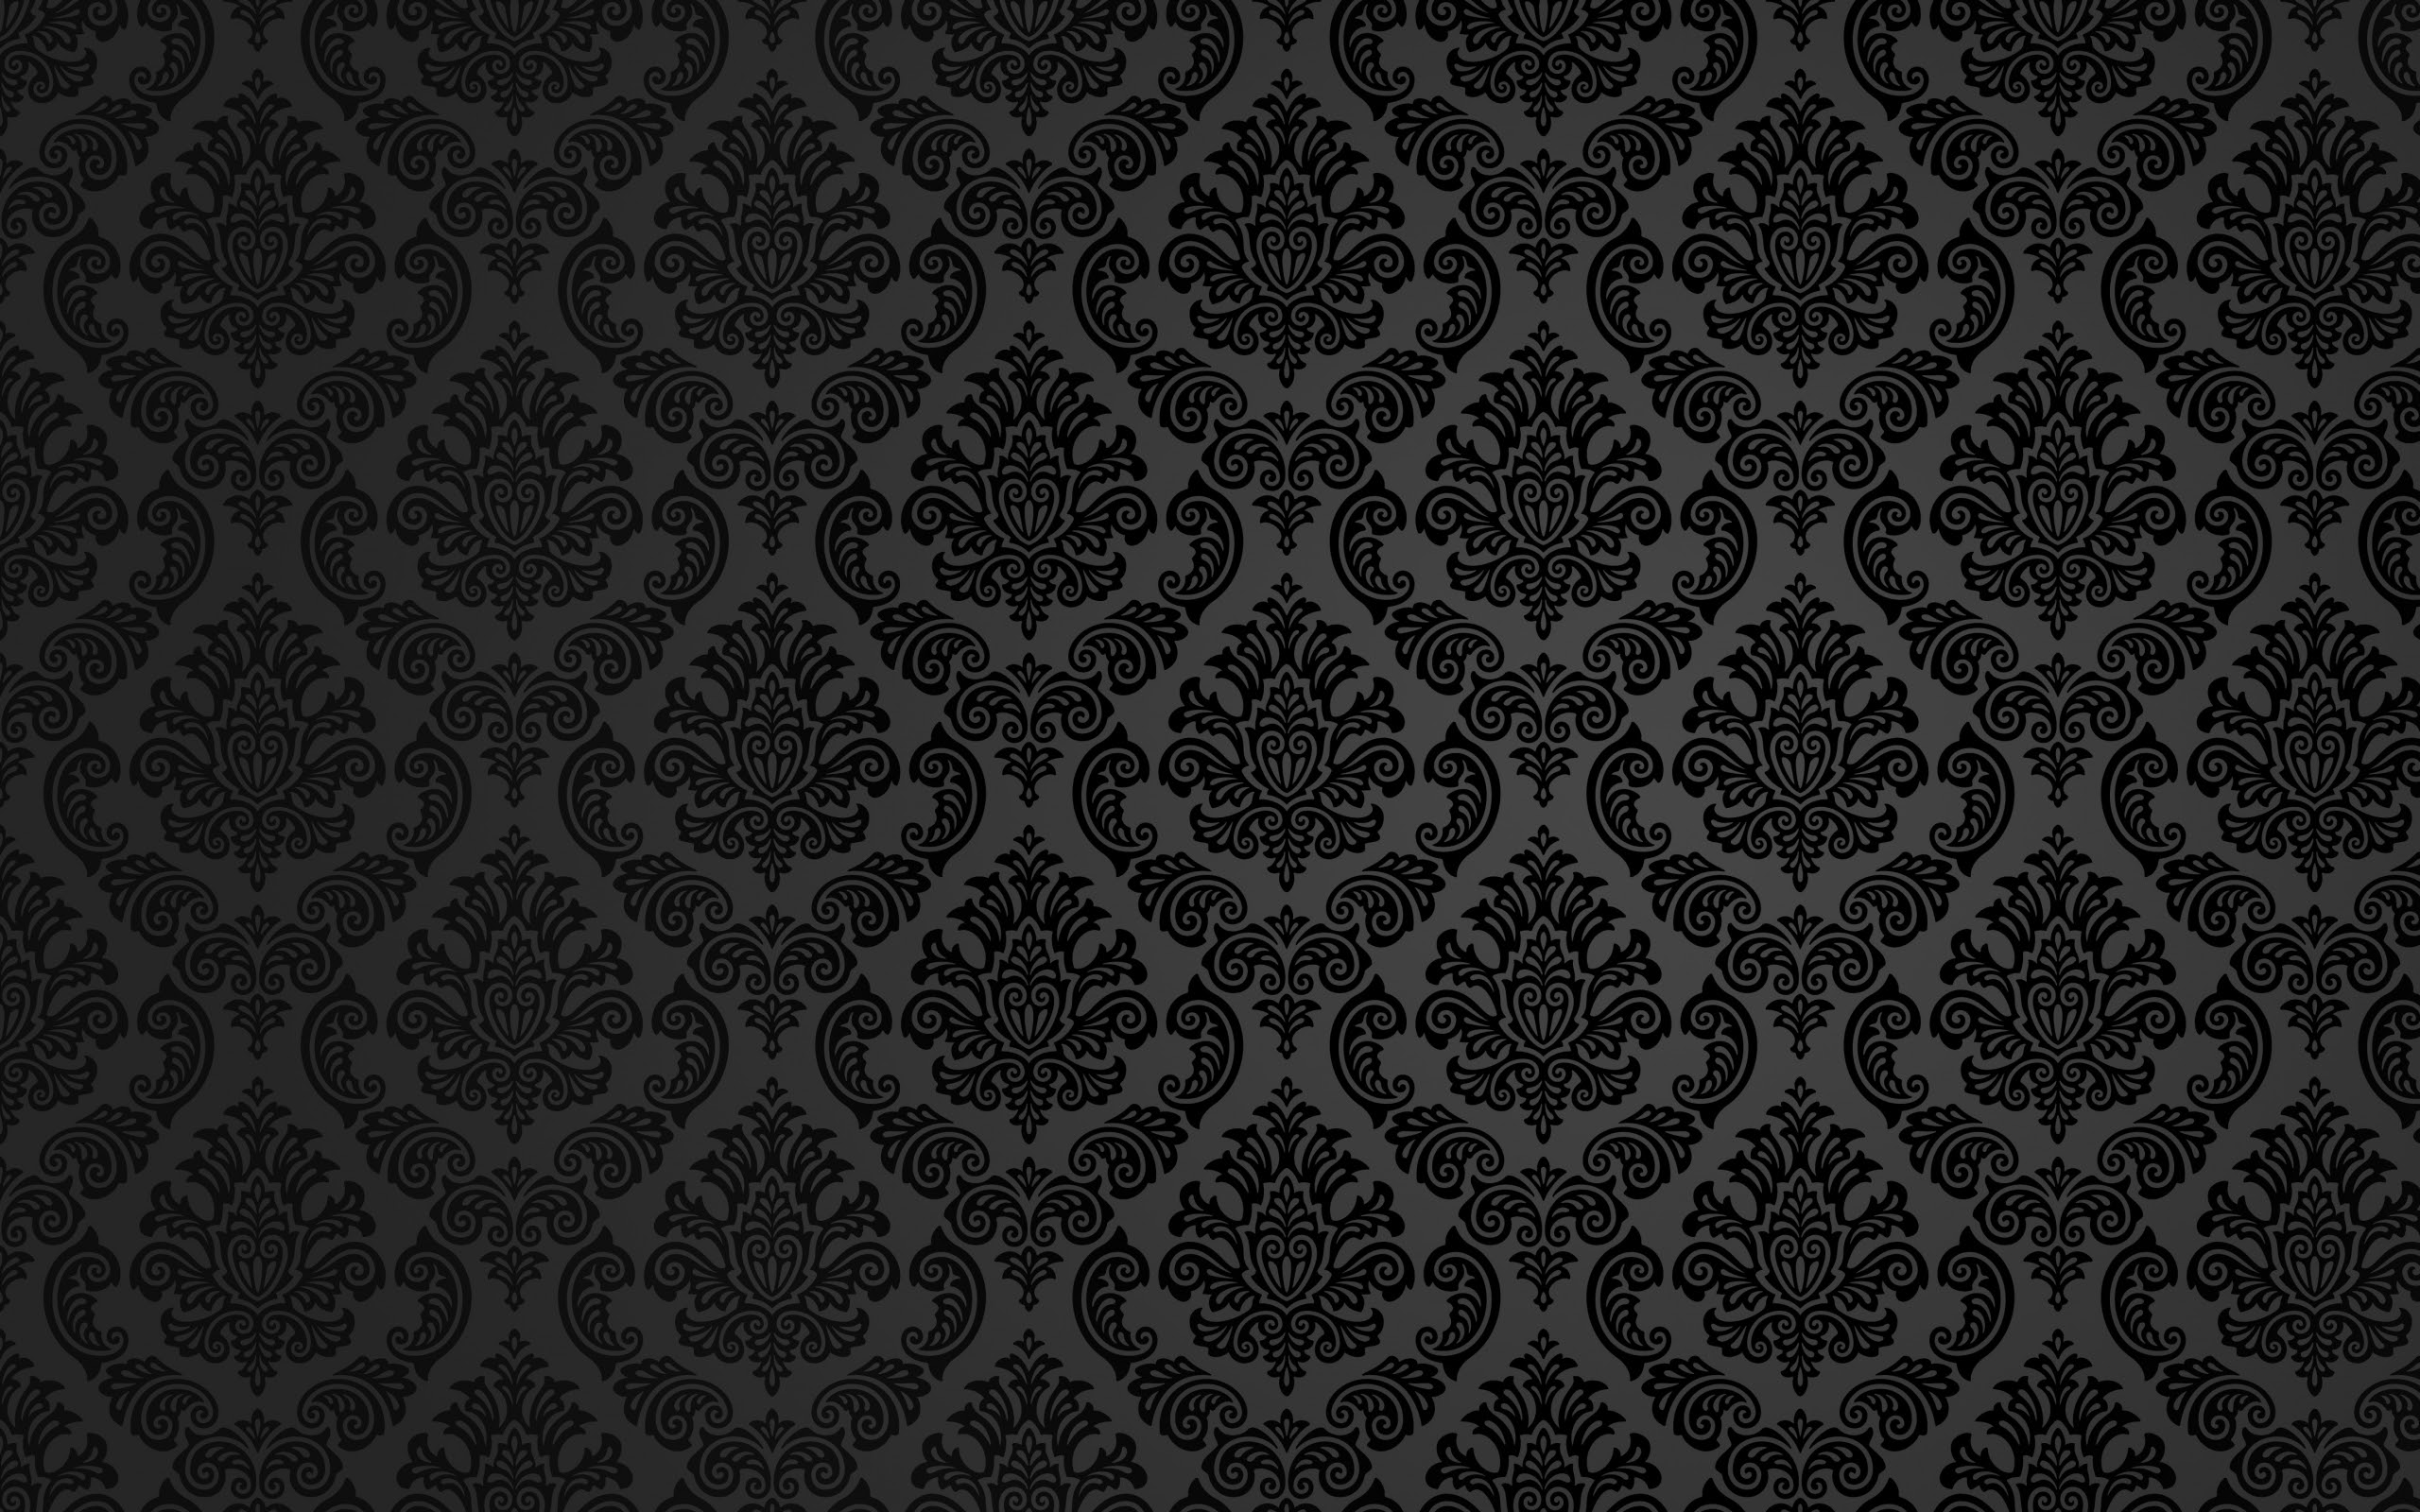 Black And White Damask Wallpaper 14 Background  Hdblackwallpaper.com